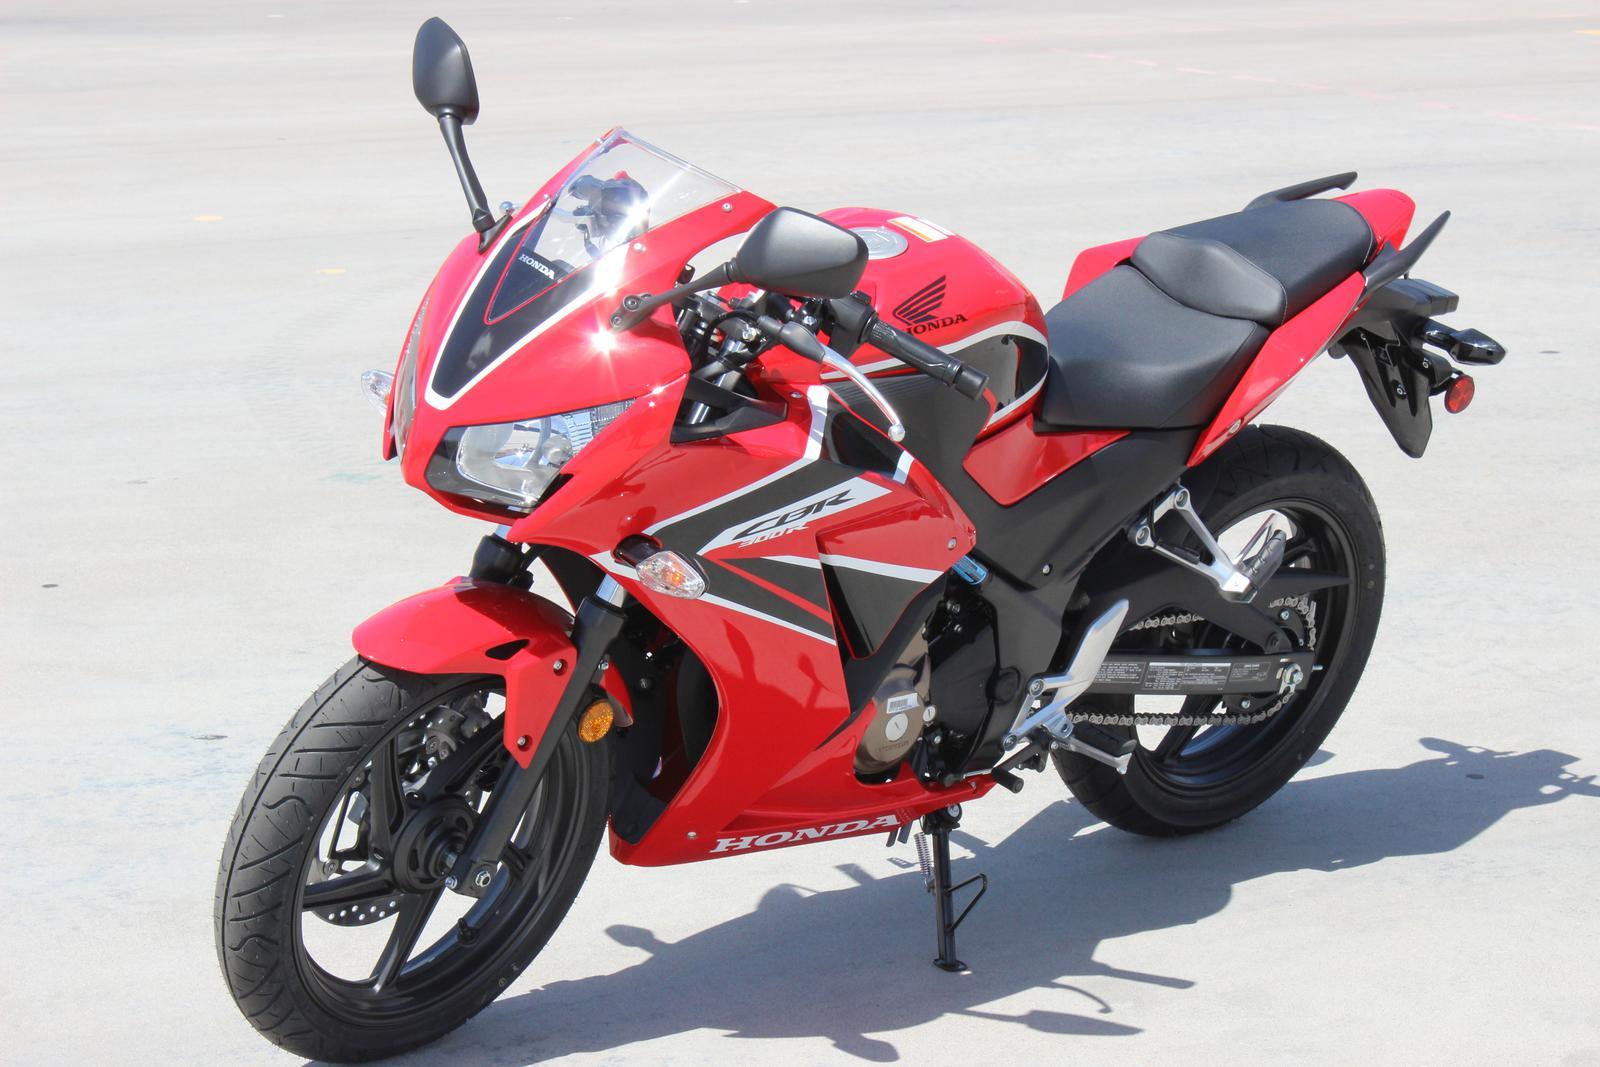 2017 Honda Cbr300r For In Scottsdale Az Go Motorcycles 480 609 1800